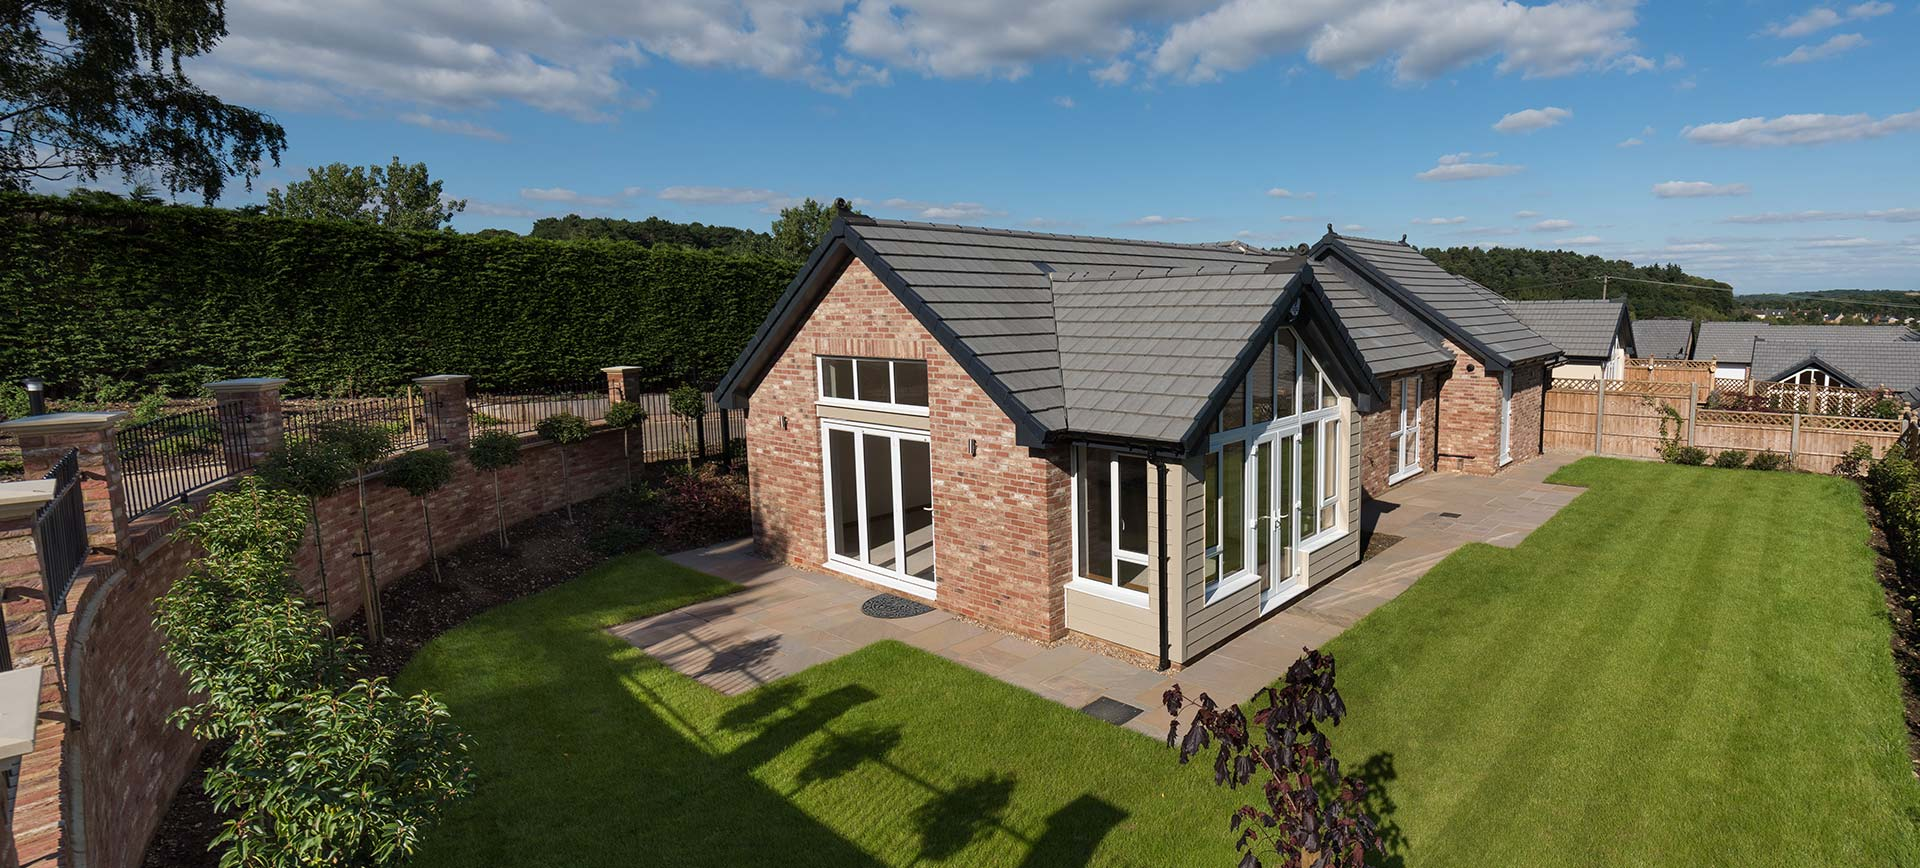 New Build Homes Maulden